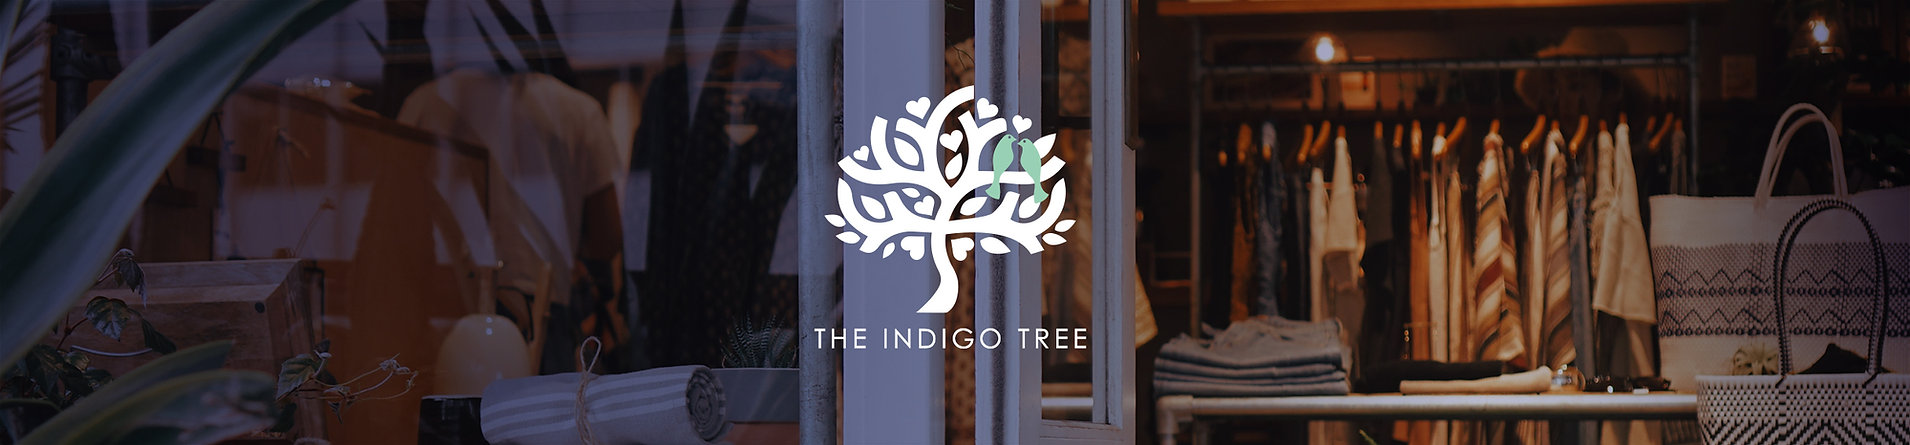 Indigo-tree-shop-banner.jpg